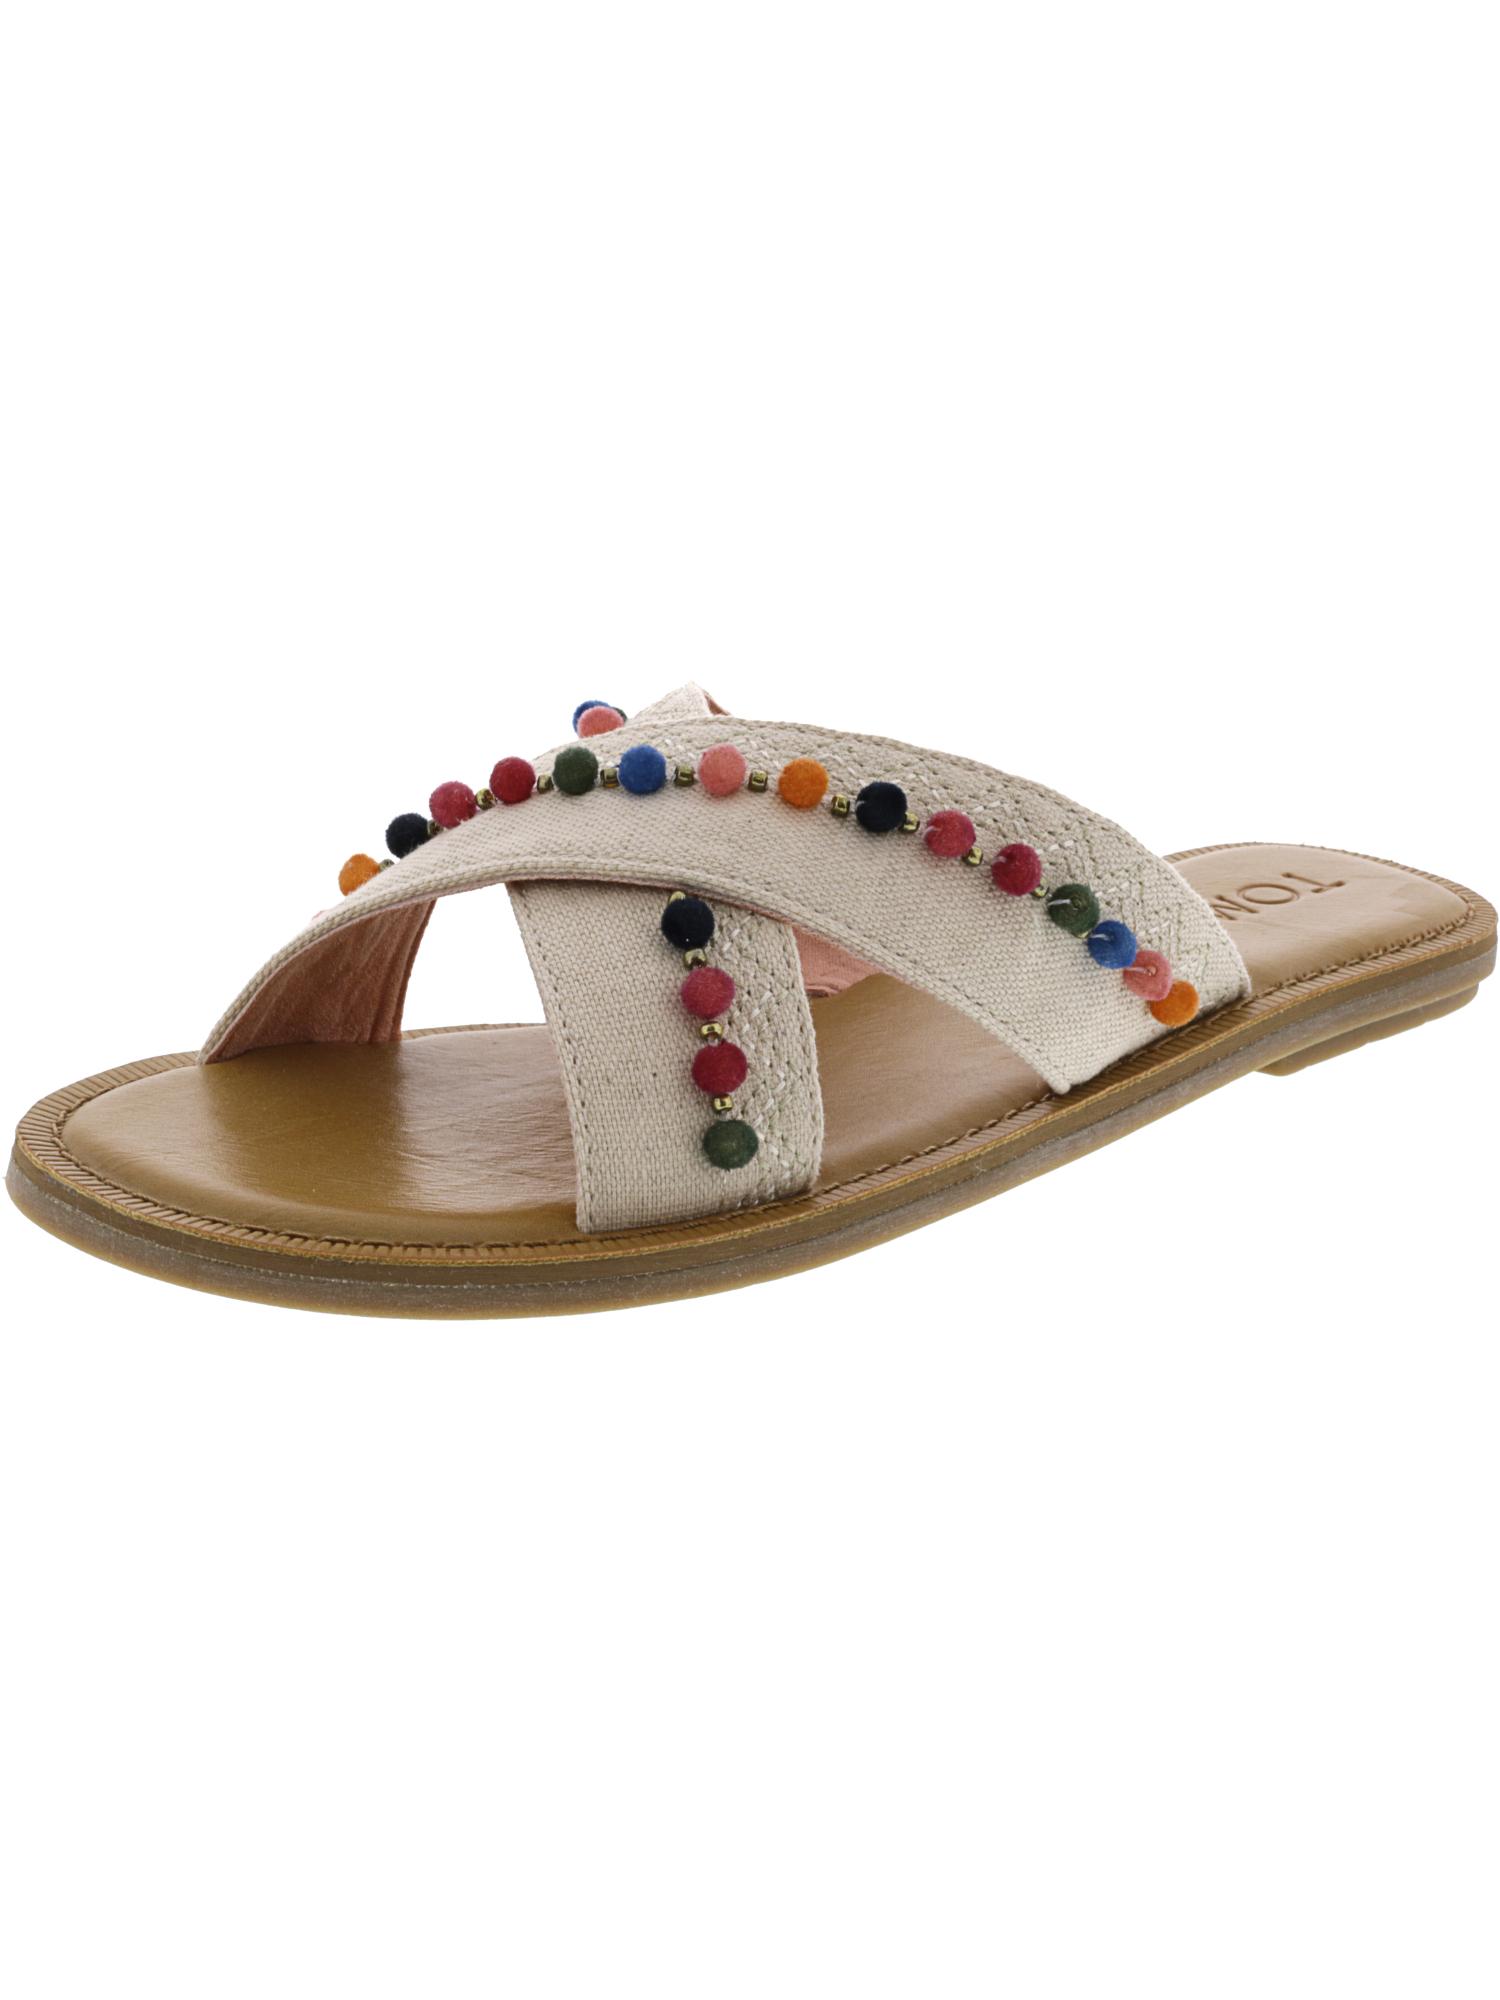 9c2692658b4 Toms-Women-039-s-Viv-Hemp-Canvas-Sandal